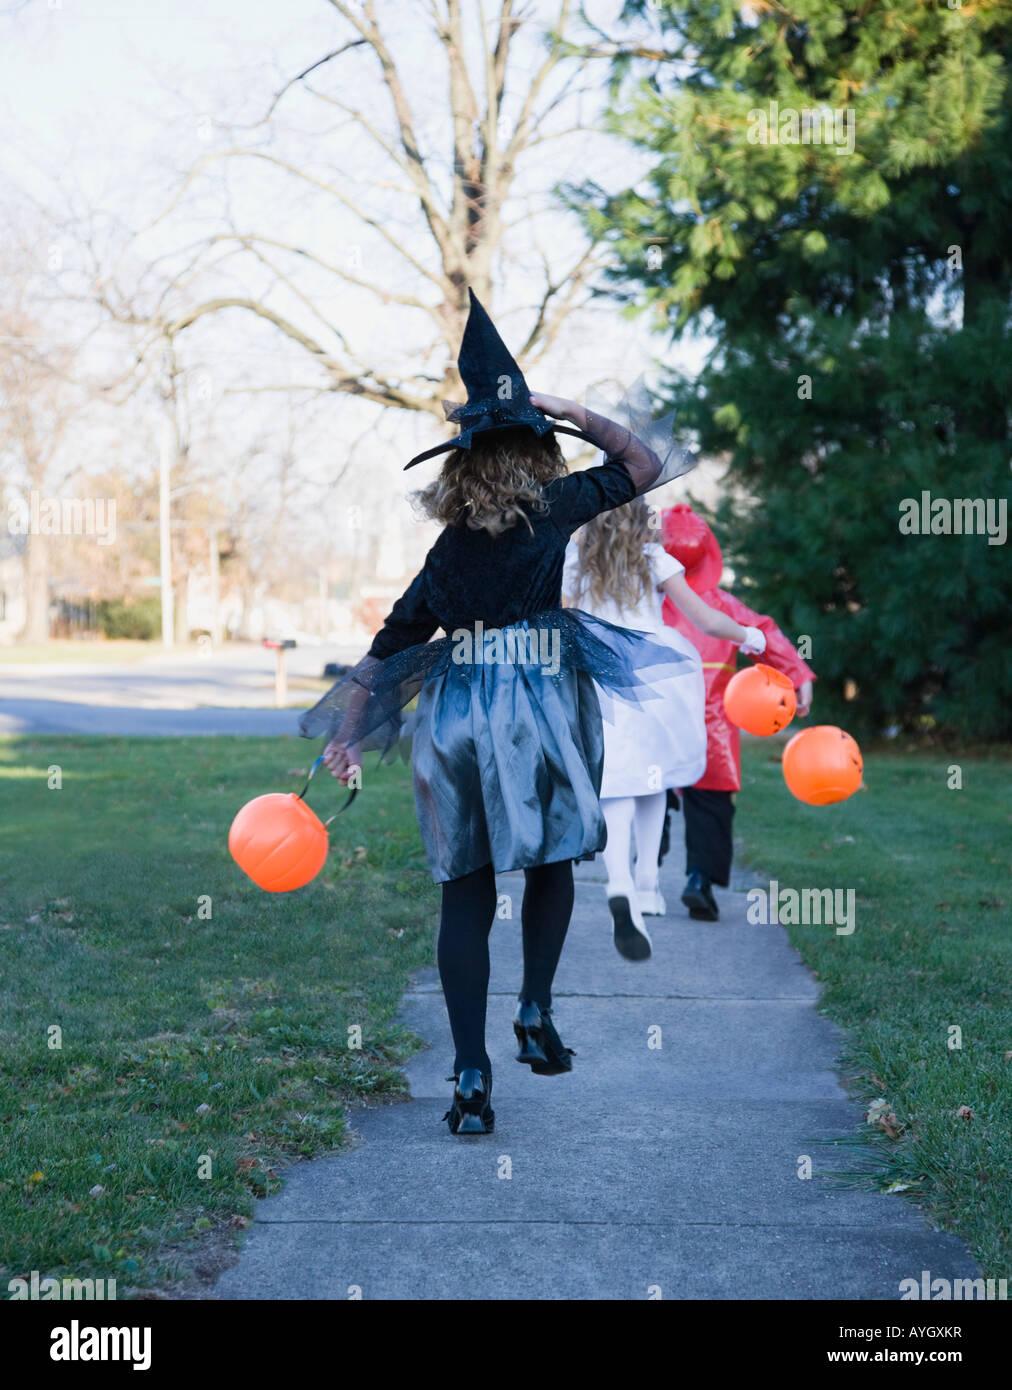 Children in Halloween costumes skipping on sidewalk - Stock Image